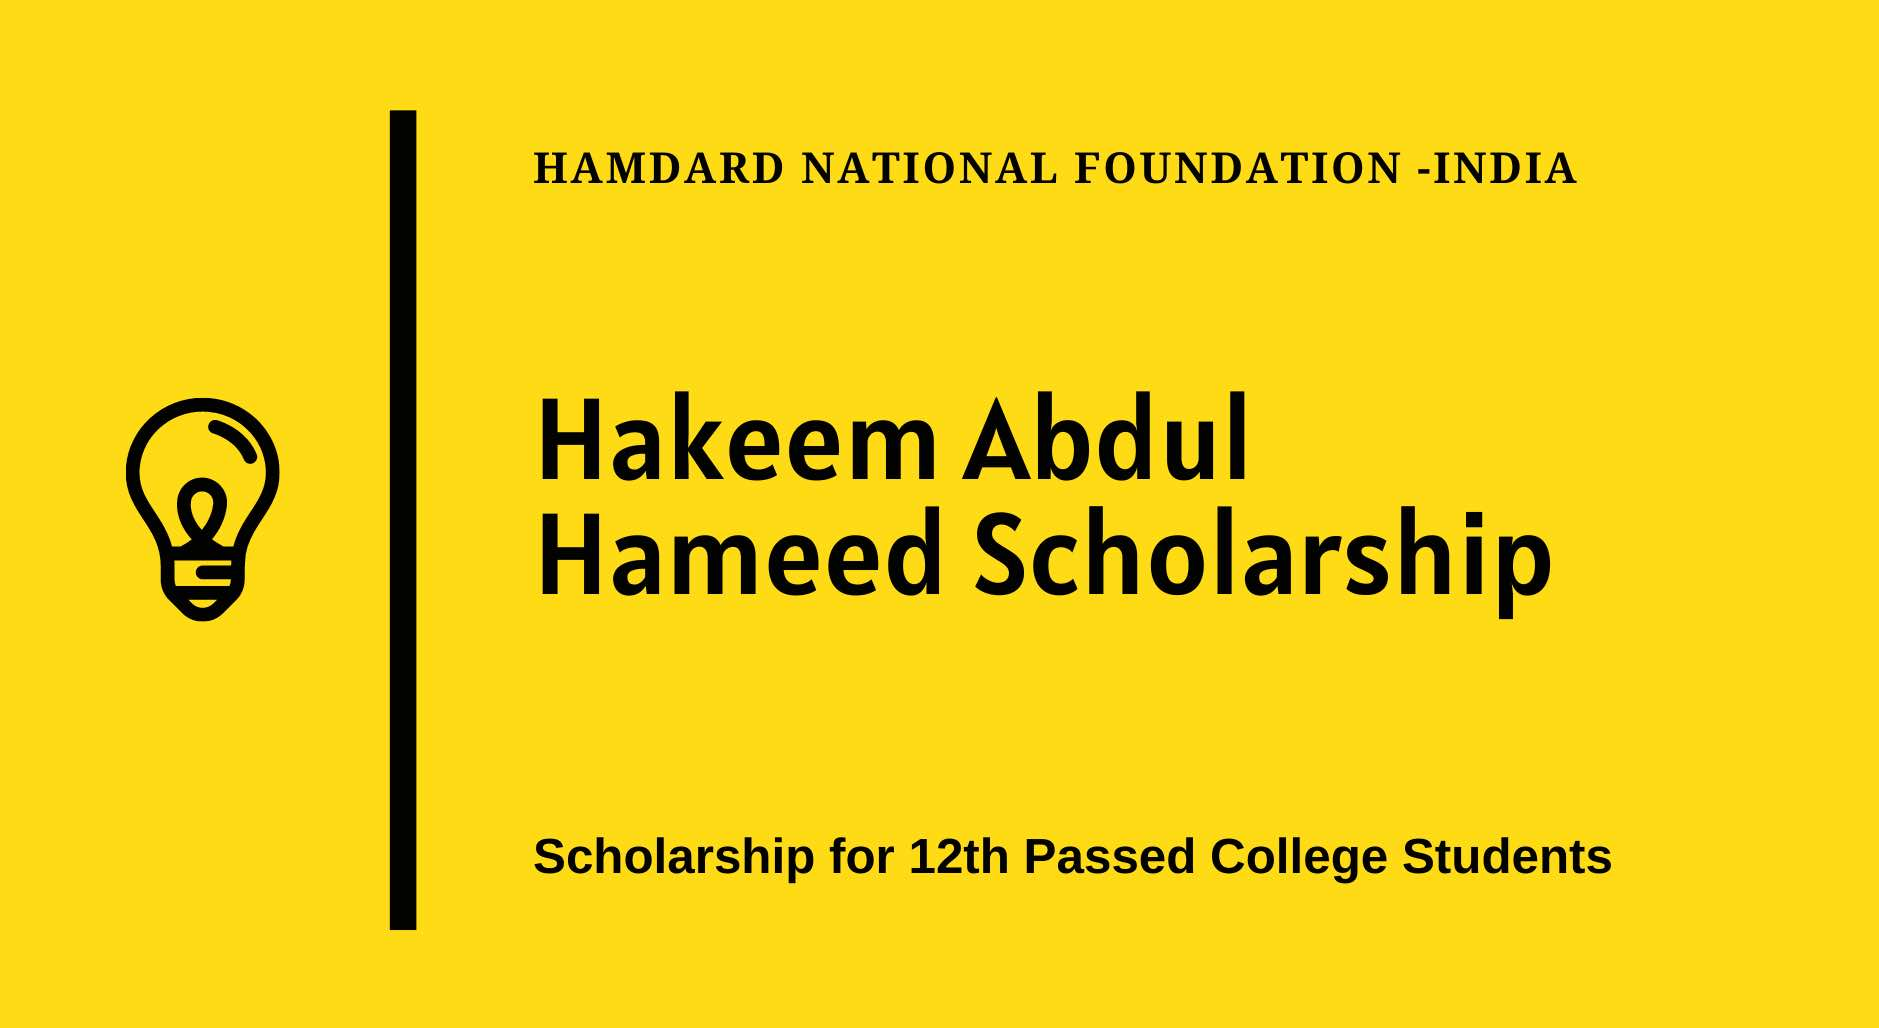 Hakeem Abdul Hammed Scholarship 2020